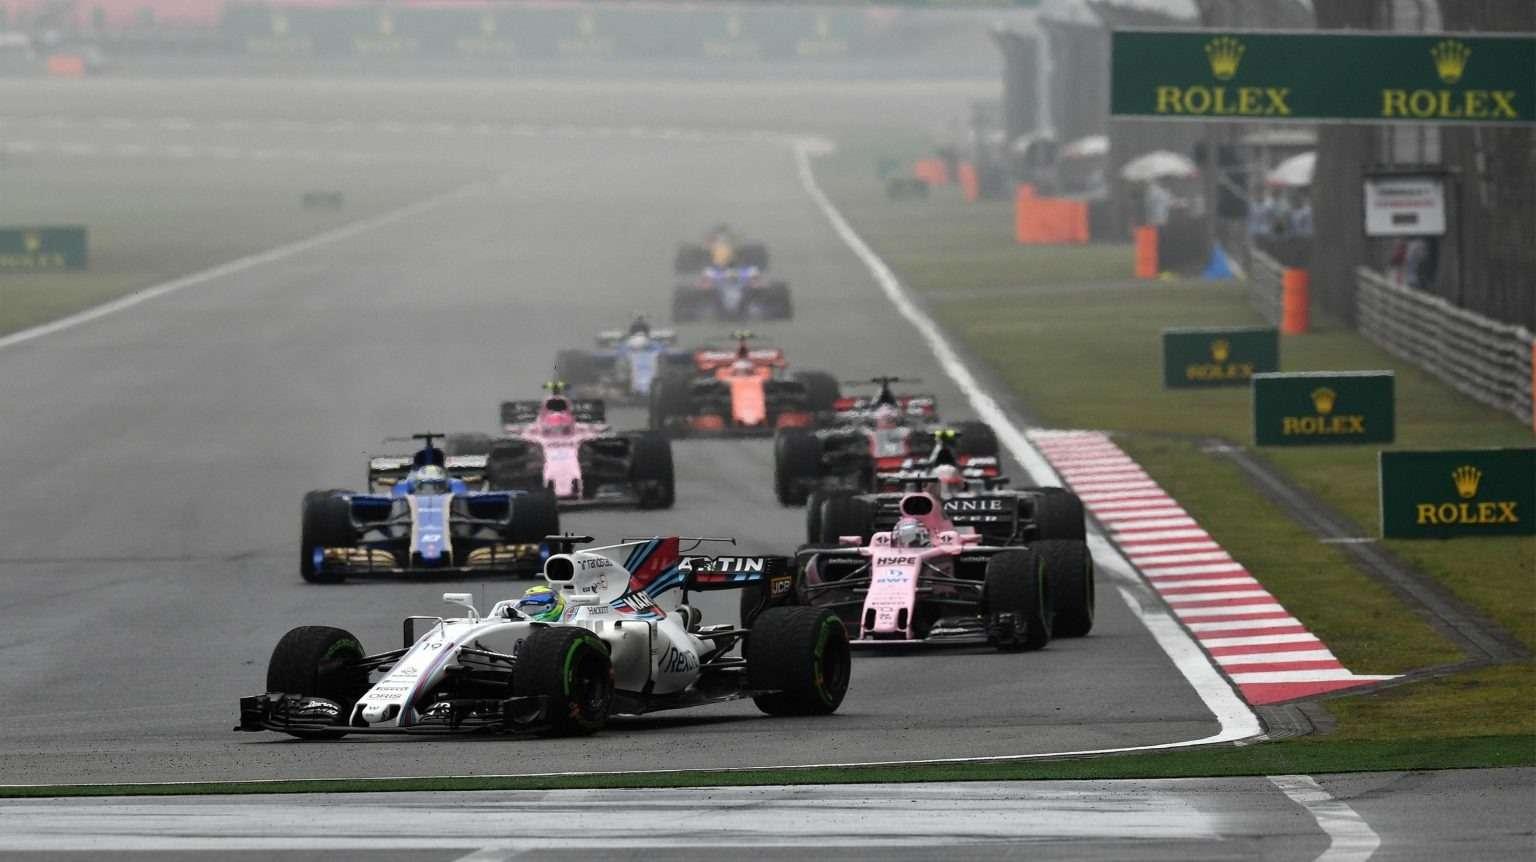 Формула 1, Ф1, Себастьян Феттель, Льюис Хэмилтон, Даниил Квят, Фернандо Алонсо, Гран-при Китая, ГПКитая